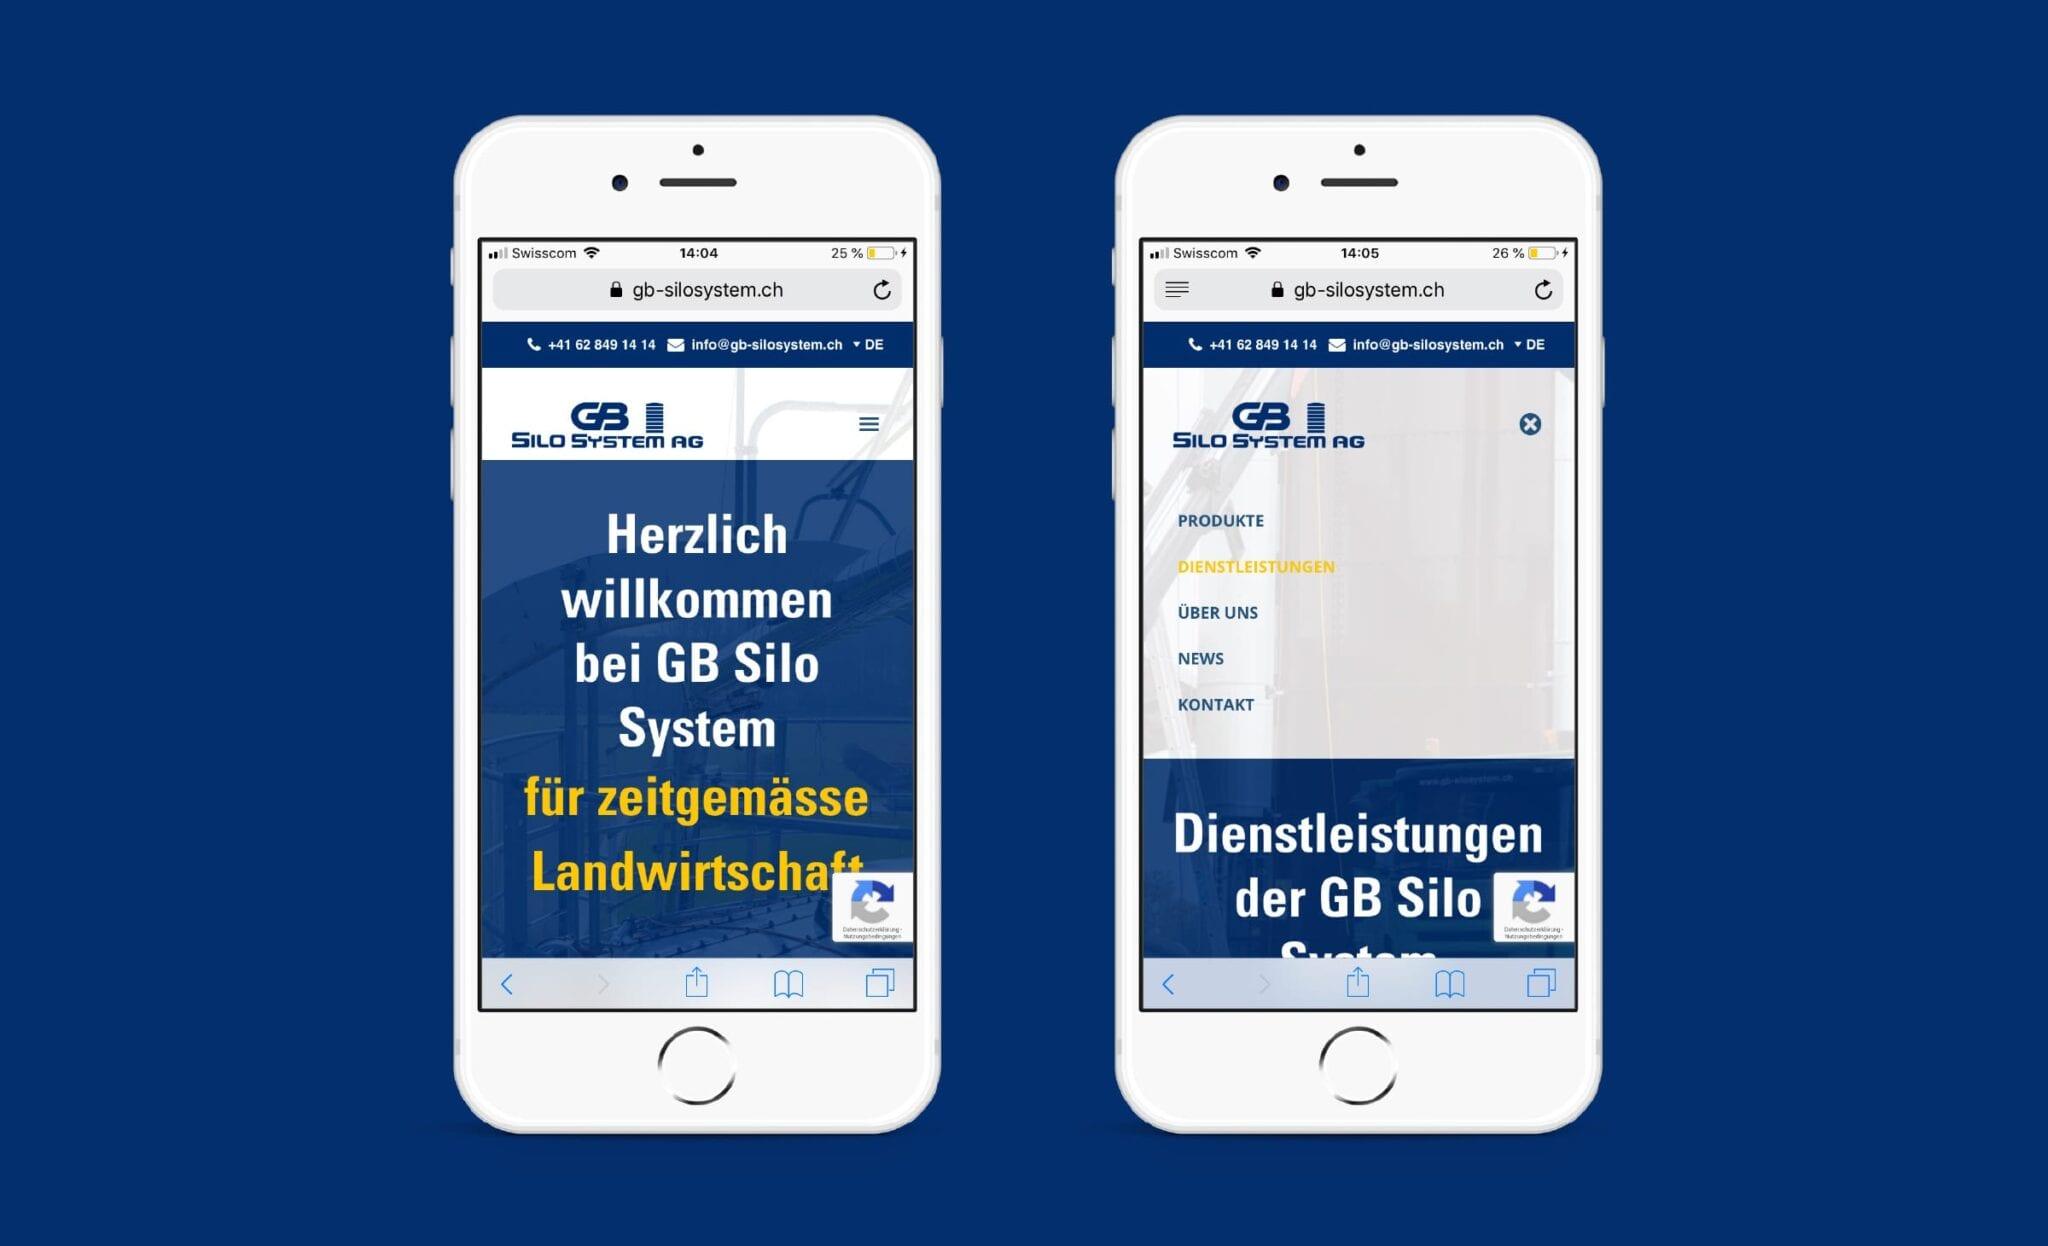 180grad_GB_Silo_System_Website_mobile